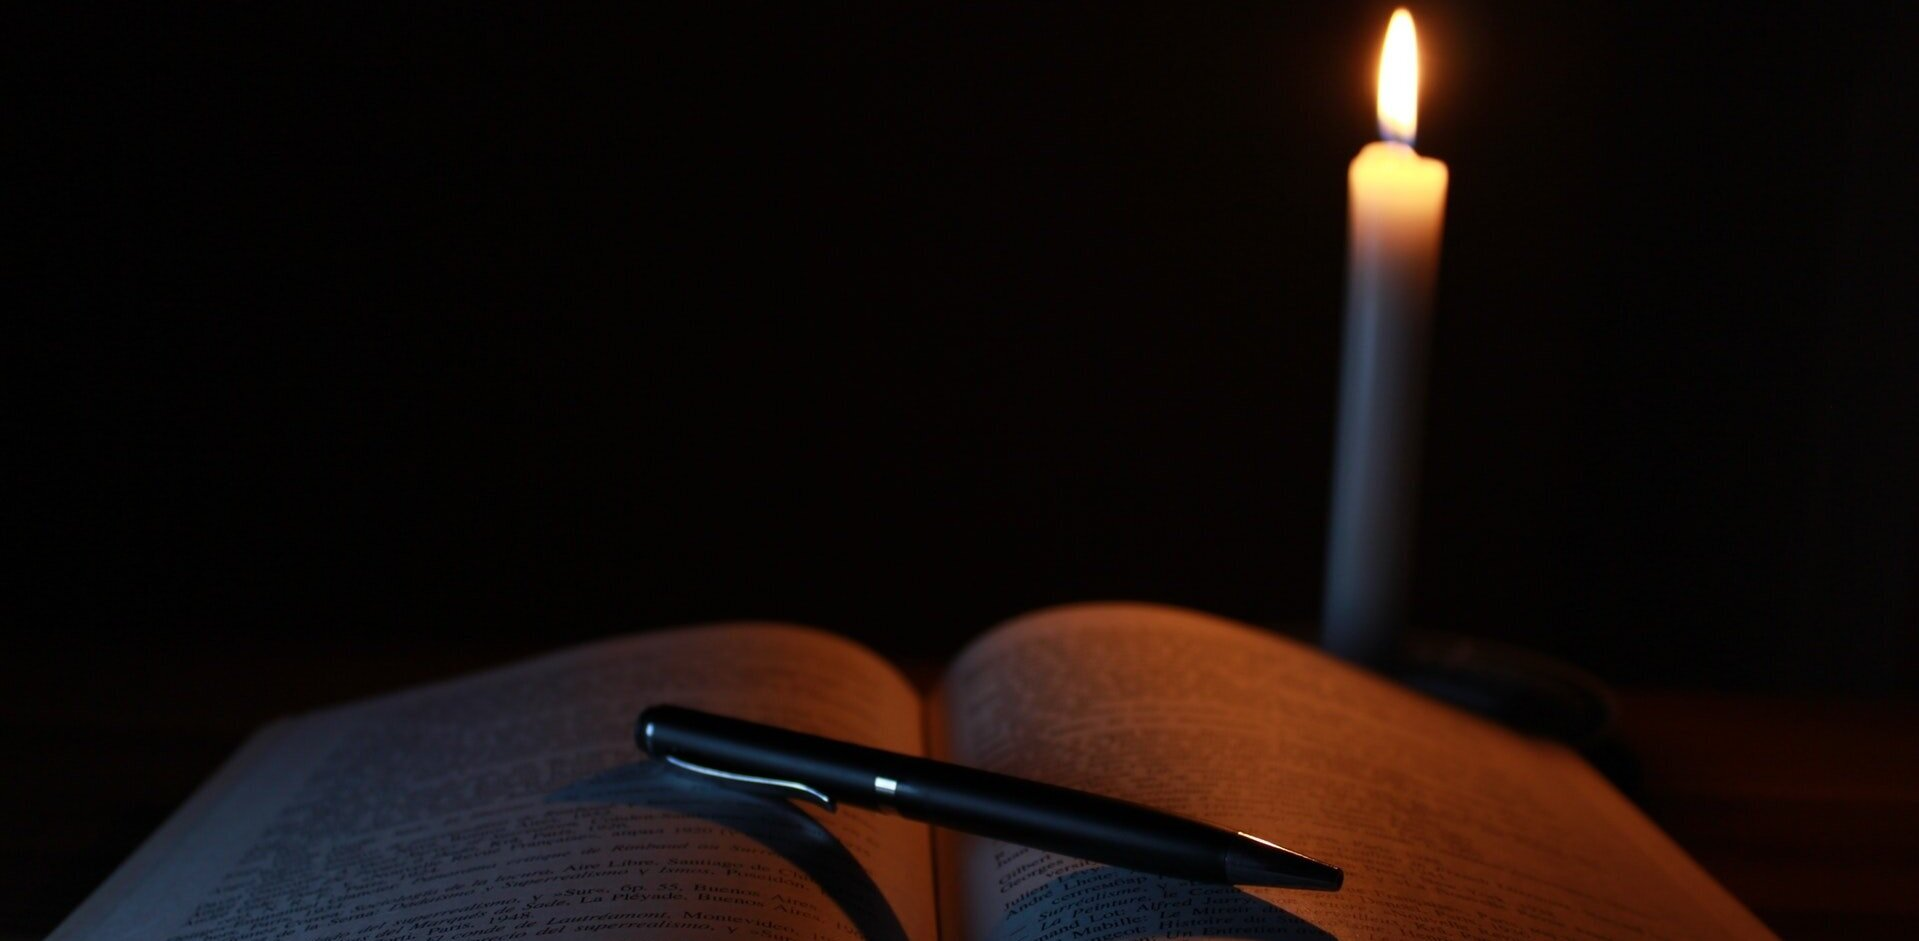 pen_candle.jpg